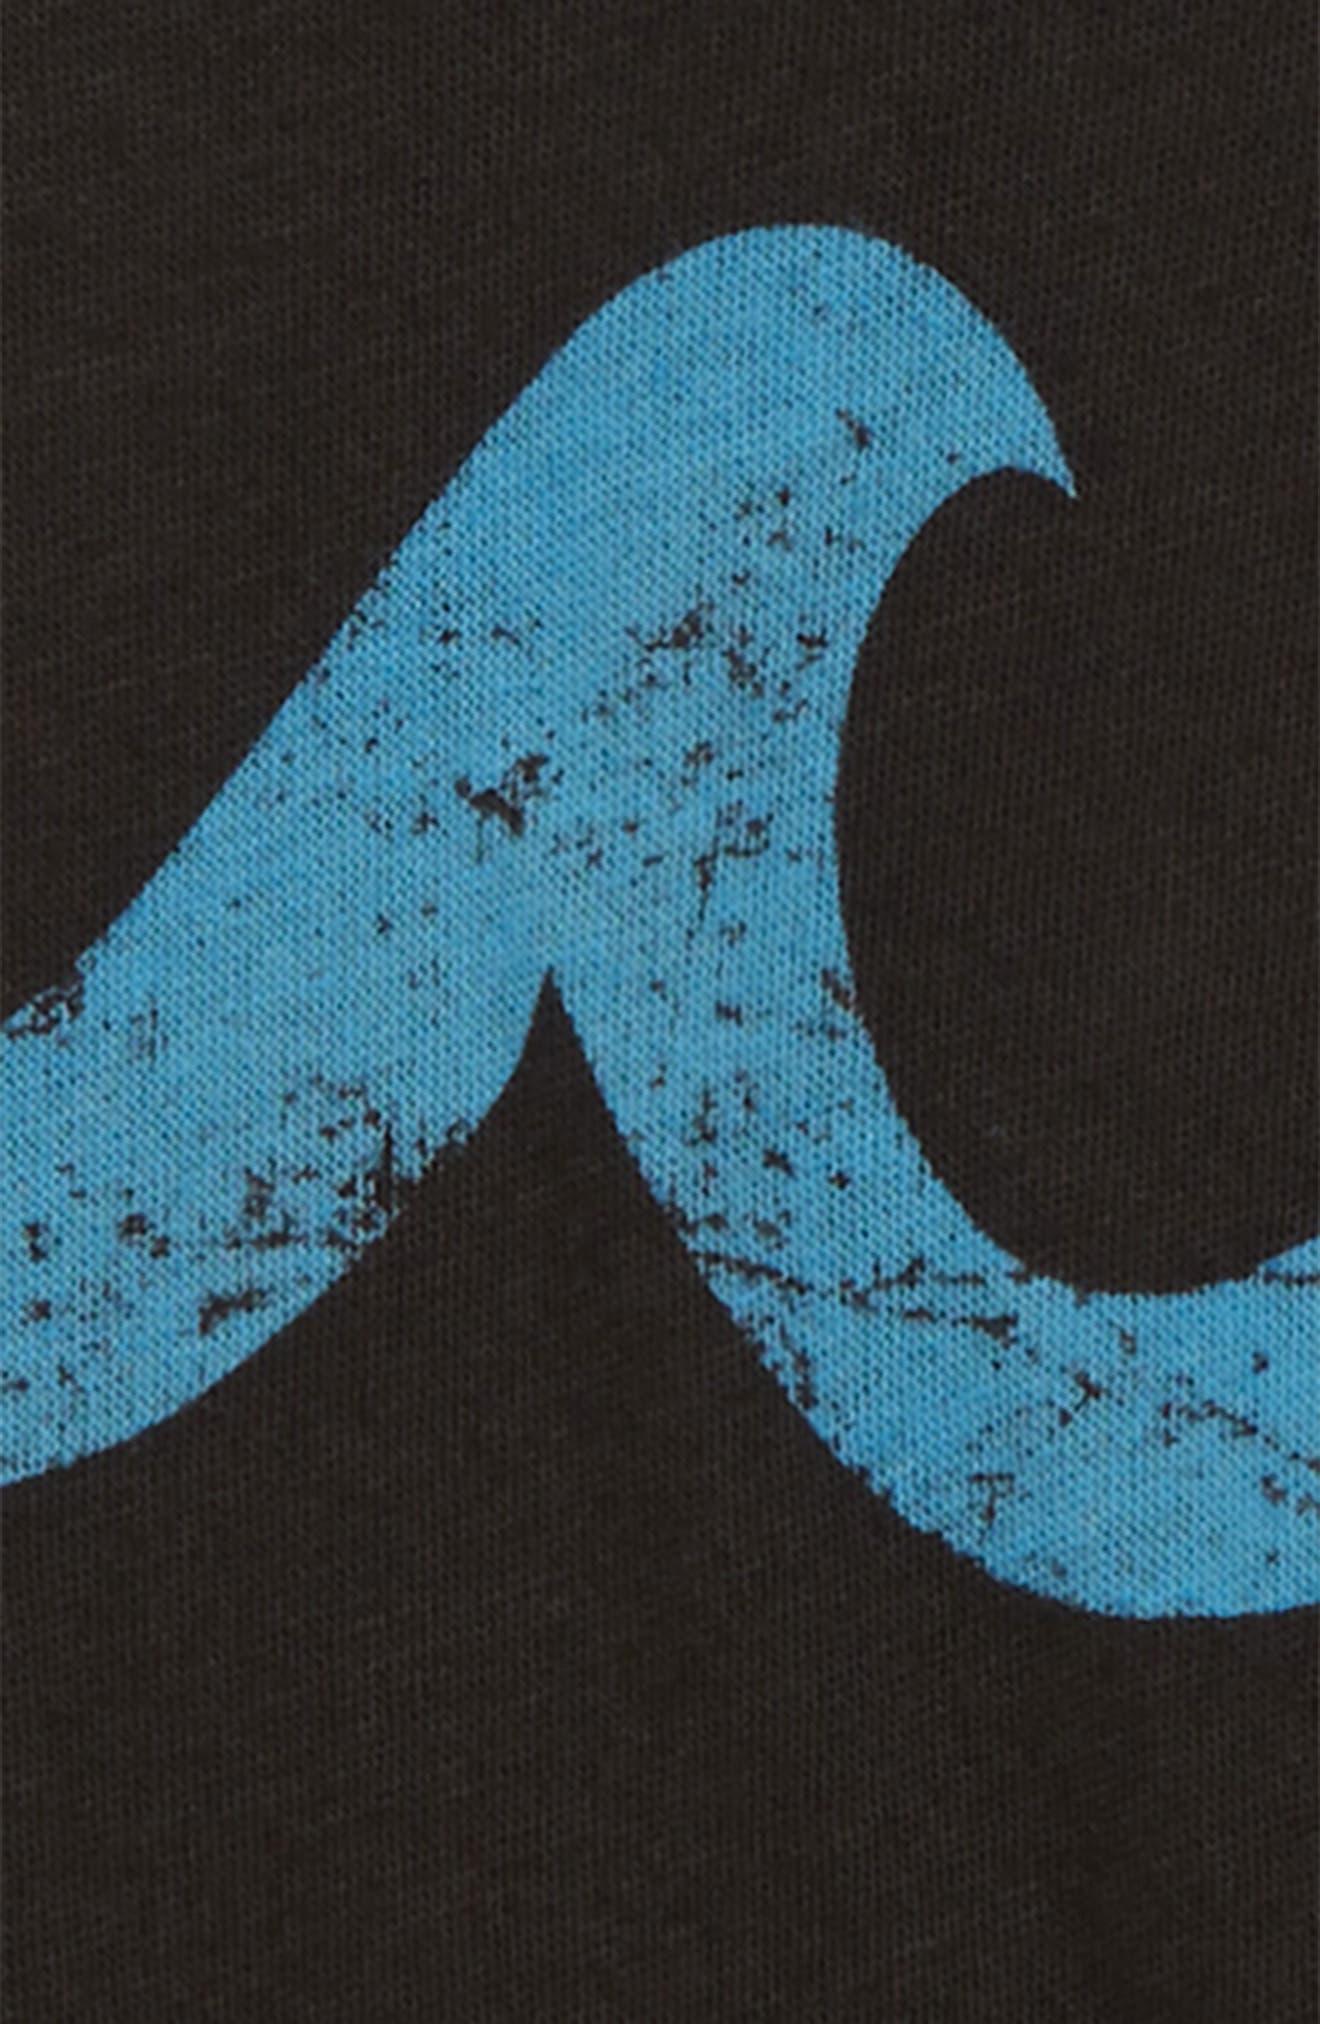 Blue Waves Graphic T-Shirt,                             Alternate thumbnail 2, color,                             011